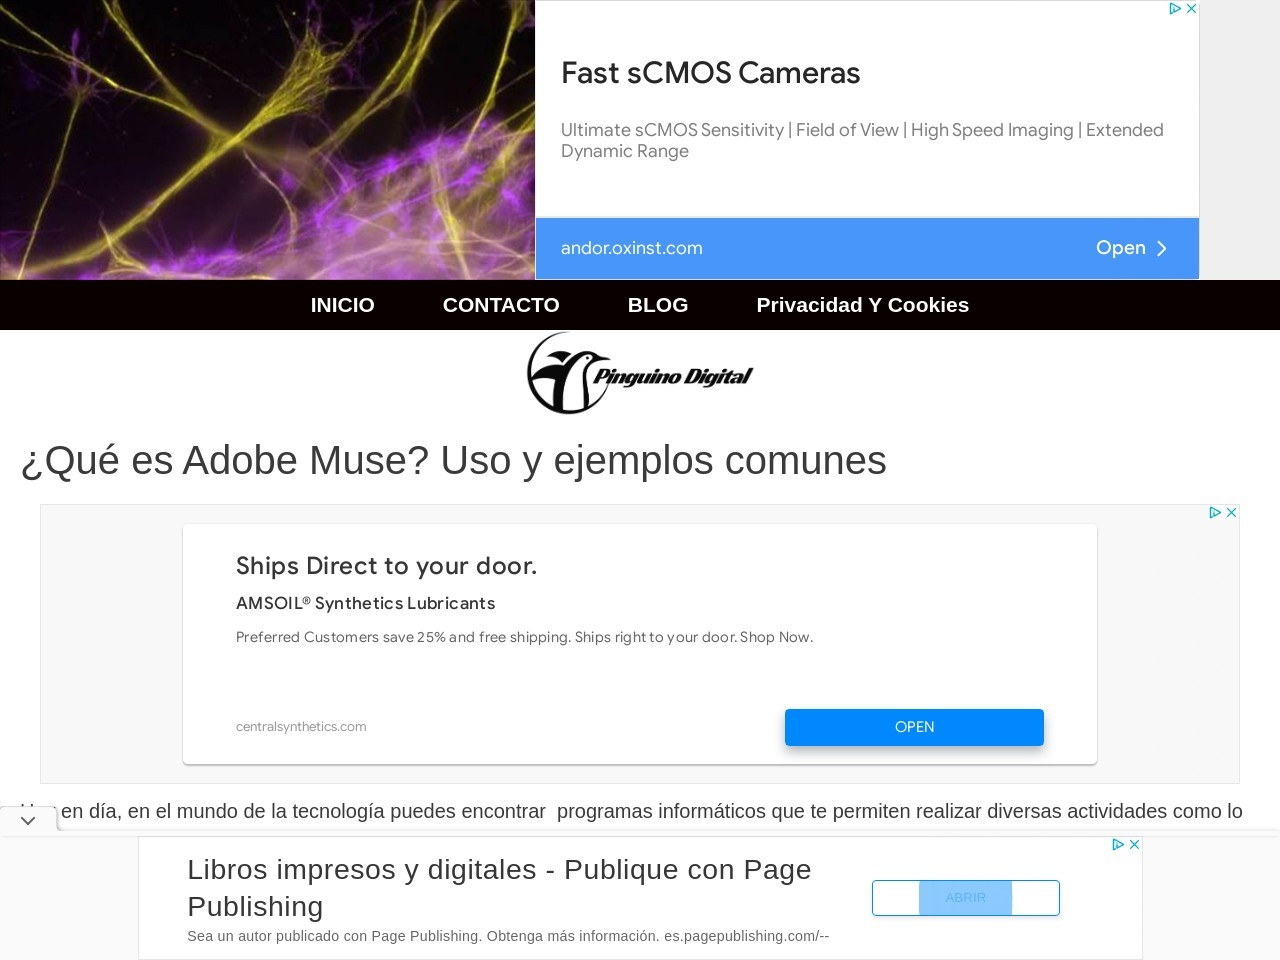 Adobe prelude para que sirve